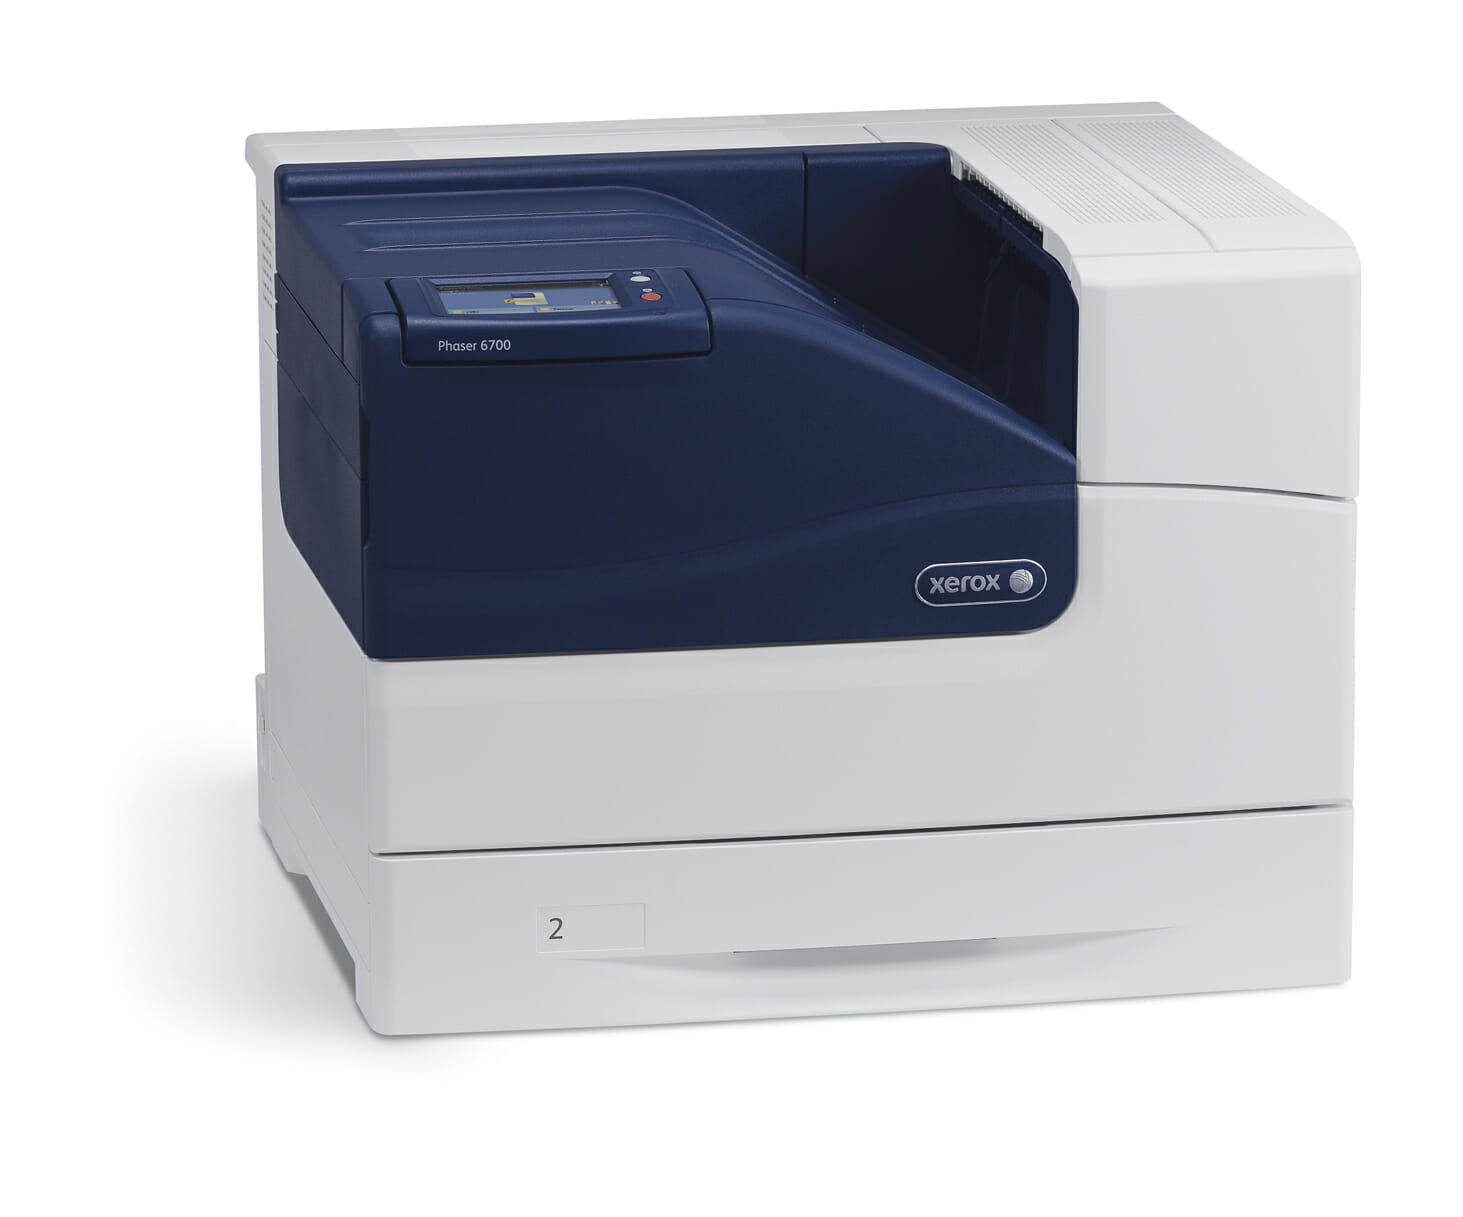 Xerox 6700